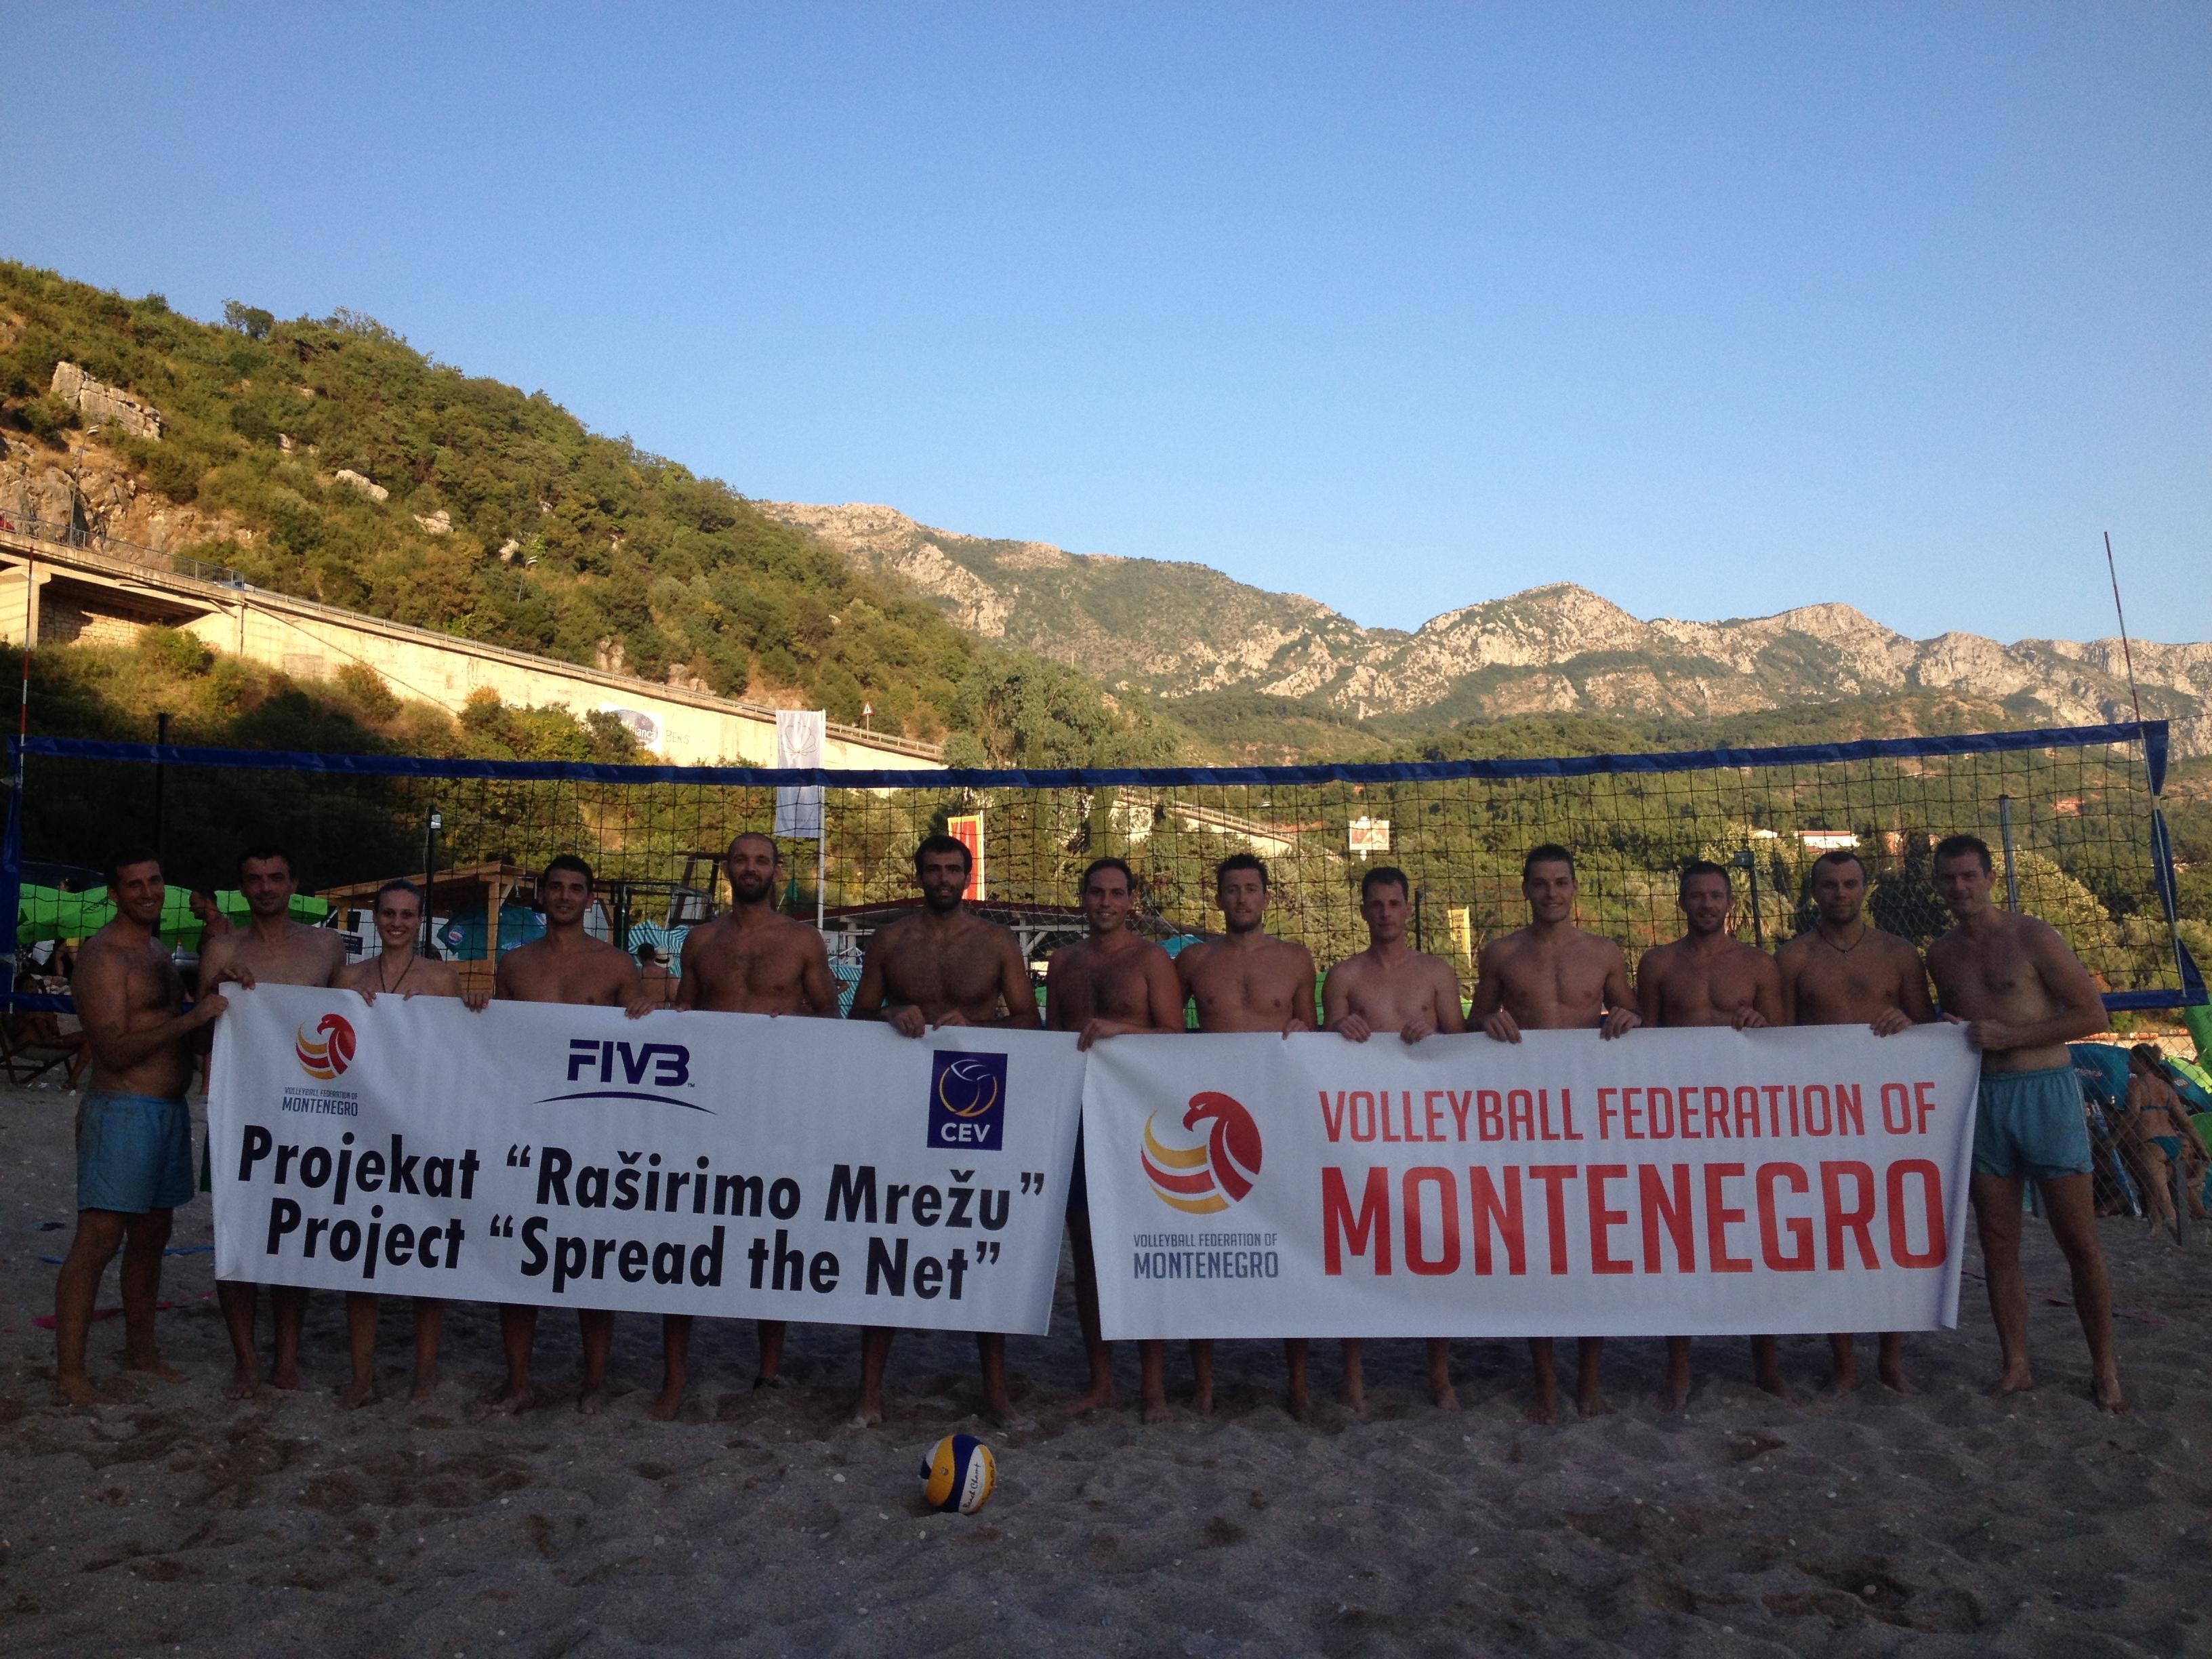 odbojka na pijesku kamenovo beach volley montenegro crna gora oscg expand the net 2